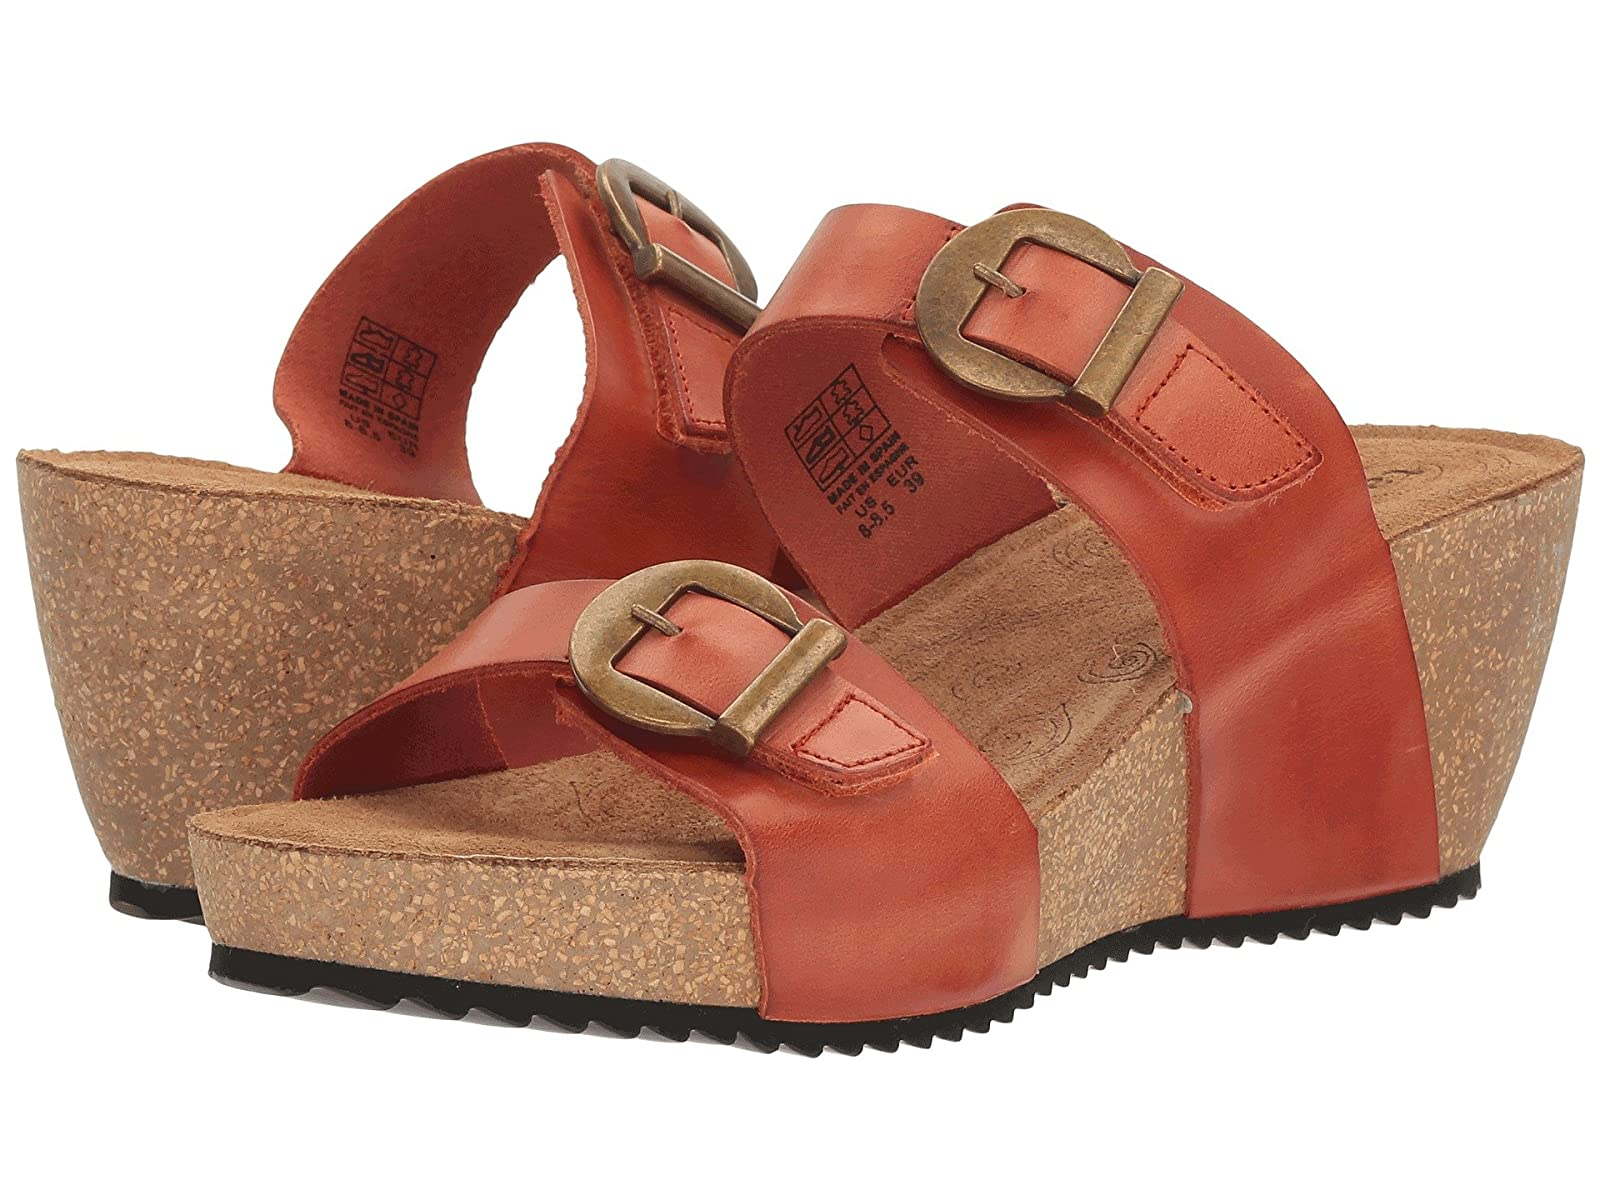 Taos Footwear AnnaCheap and distinctive eye-catching shoes